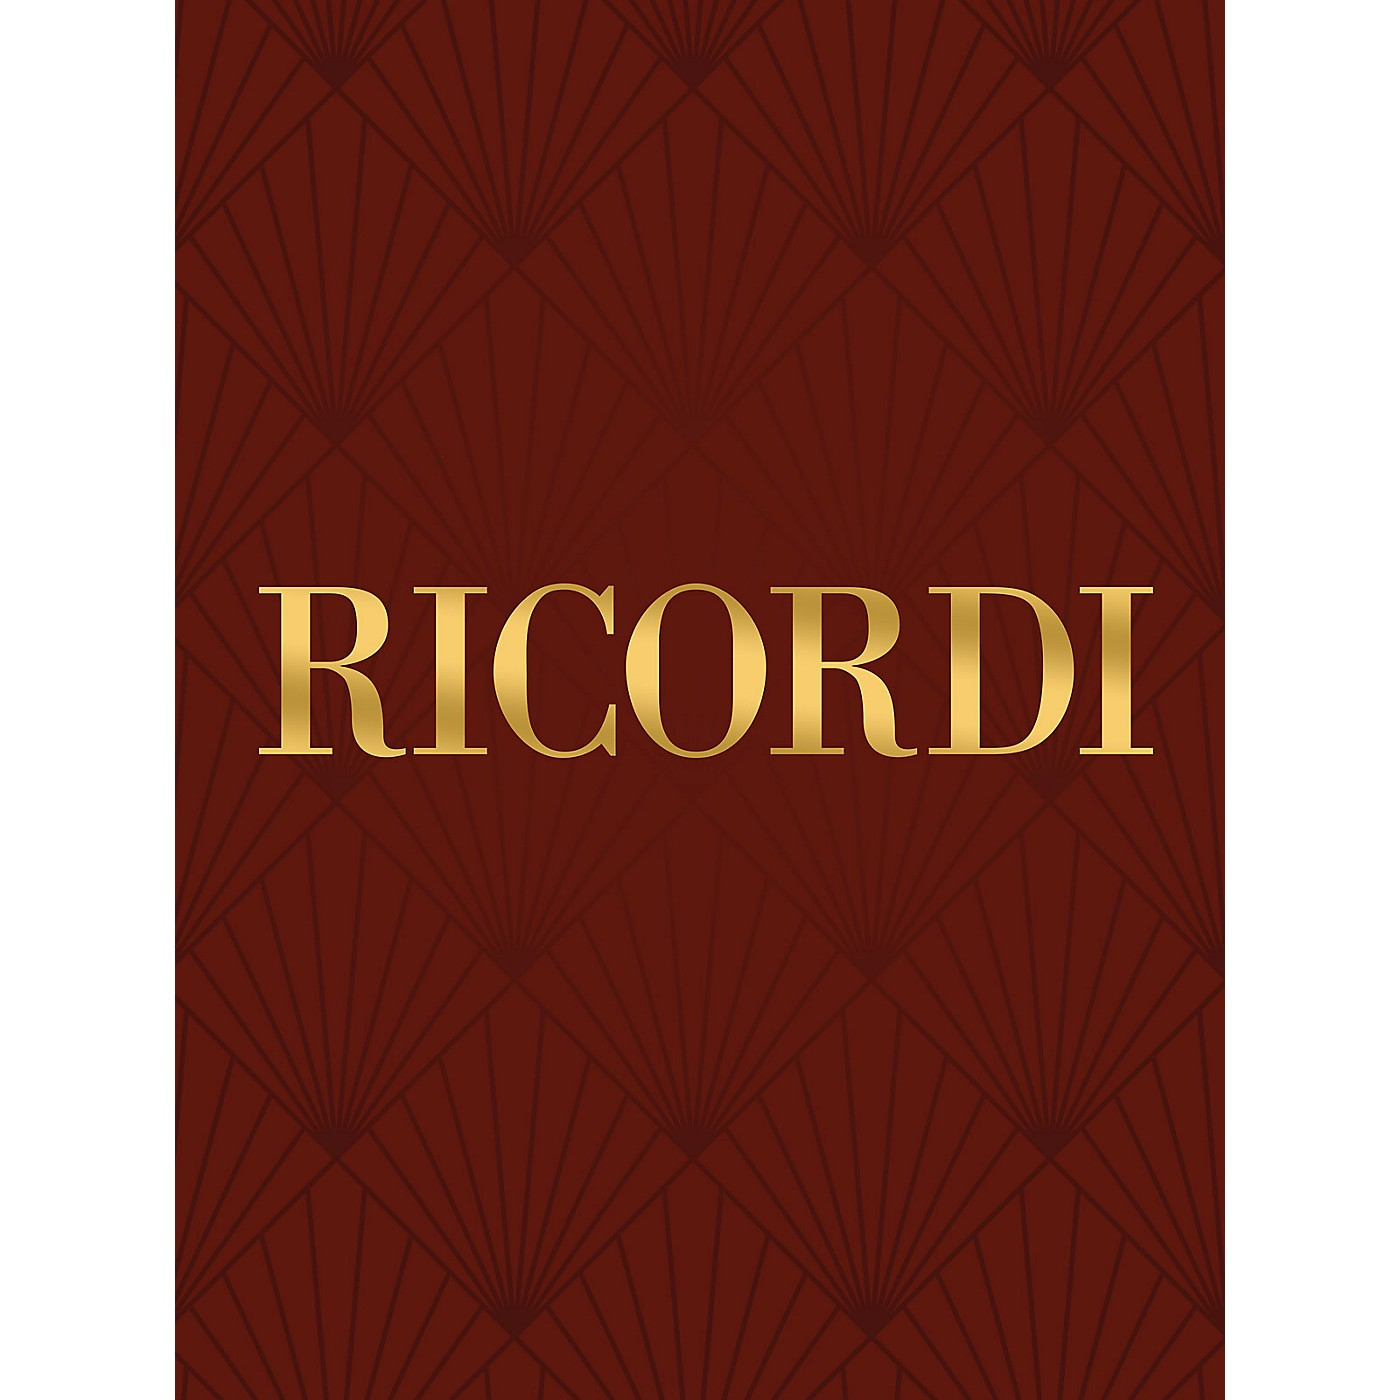 Ricordi O qui coeli terraeque serenitas RV631 Study Score Composed by Antonio Vivaldi Edited by Paul Everette thumbnail